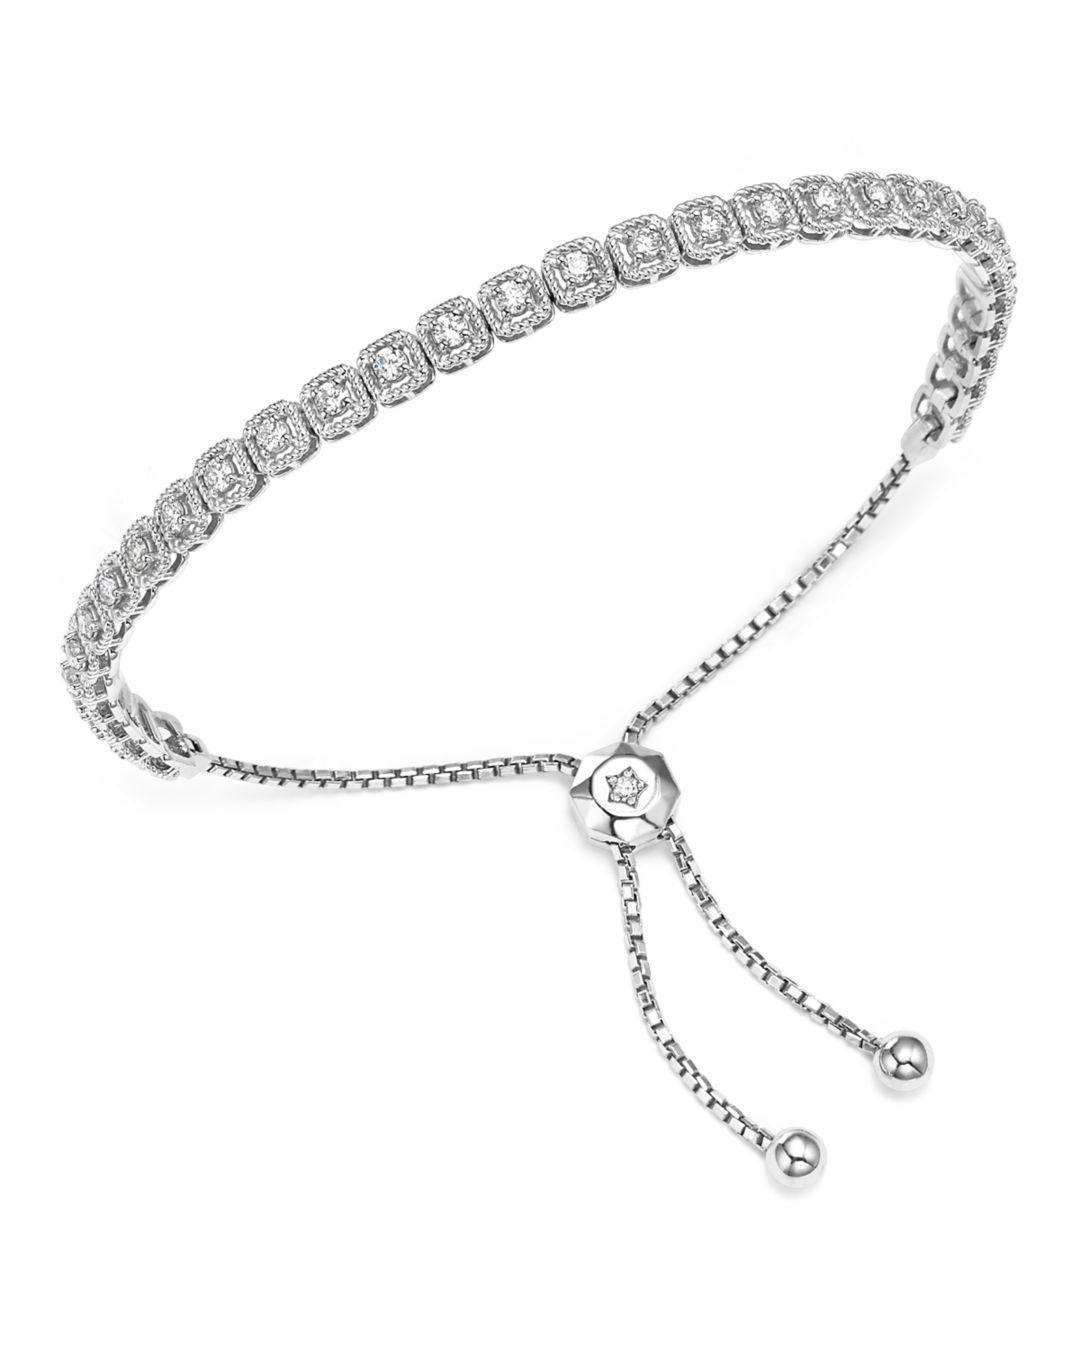 478873a779aca2 Bloomingdale's - Diamond Milgrain Bolo Bracelet In 14k White Gold, 1.0 Ct.  T.w. -. View fullscreen